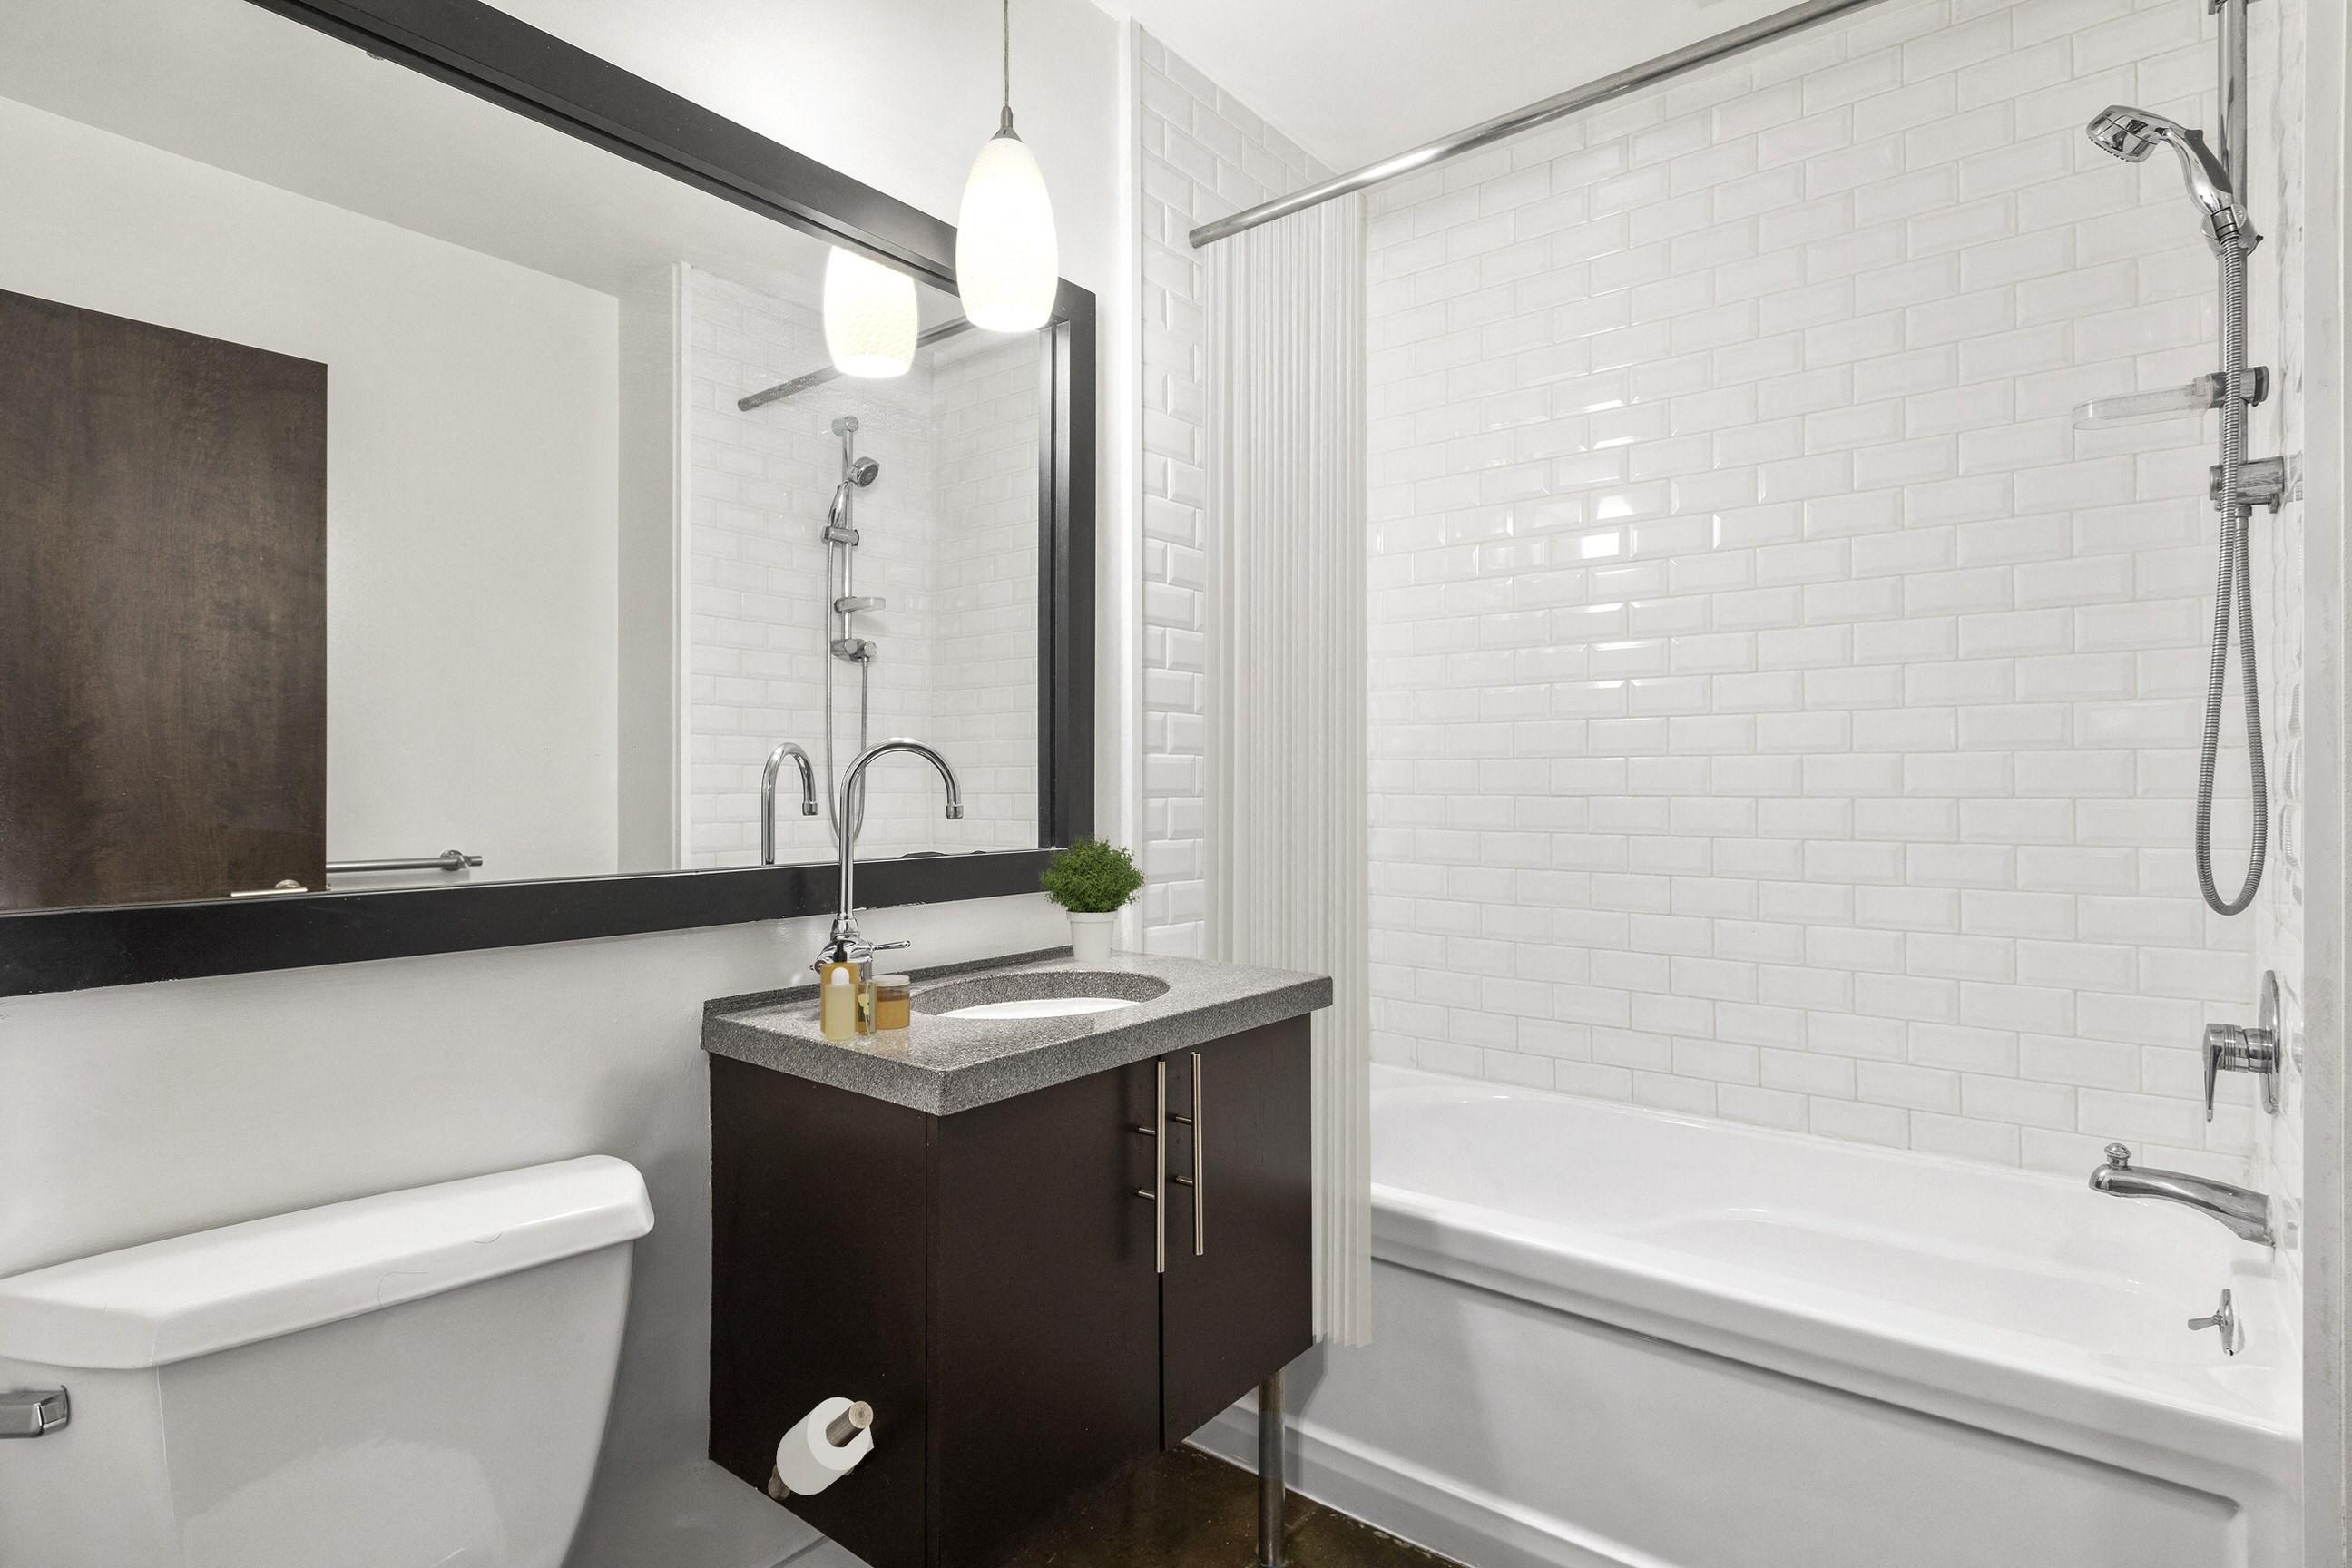 Bathroom at South Park Lofts, 818 South Grand Ave  Los Angeles, CA 90017